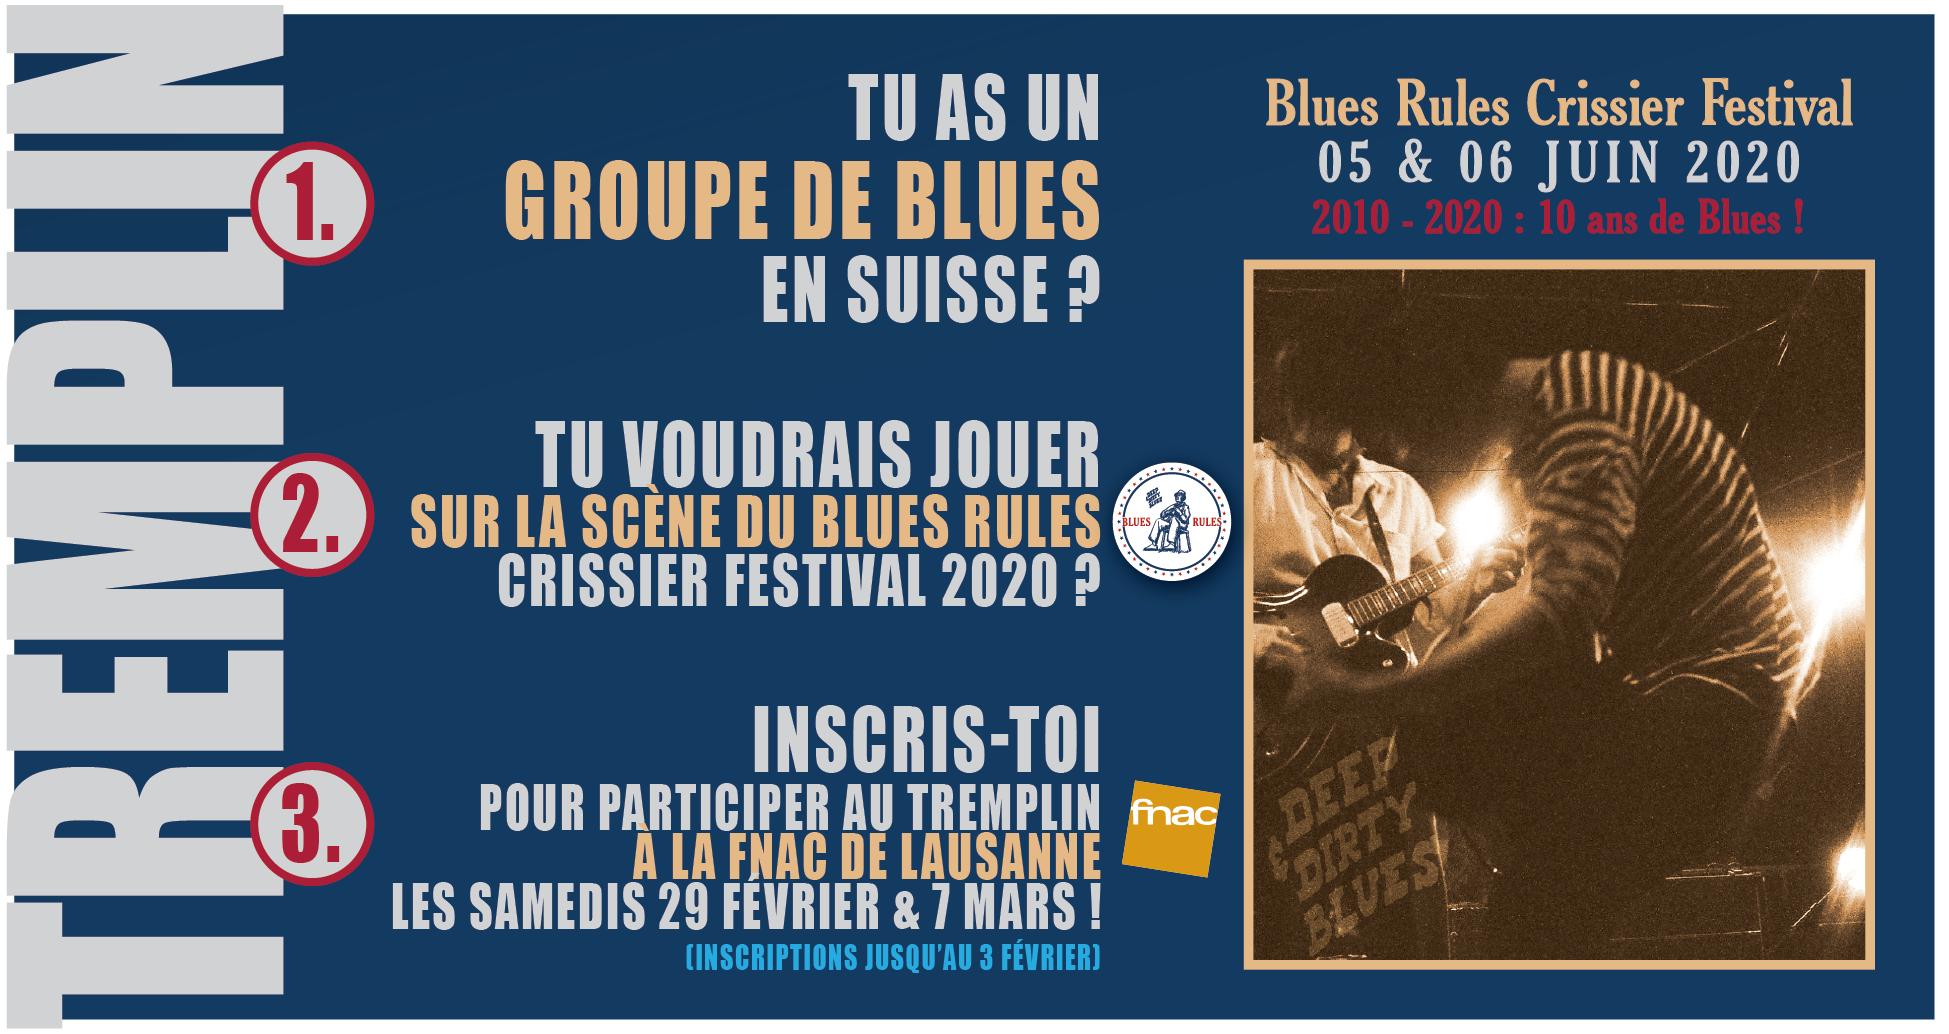 tremplin Blues Rules Crissier Festival Fnac 2020